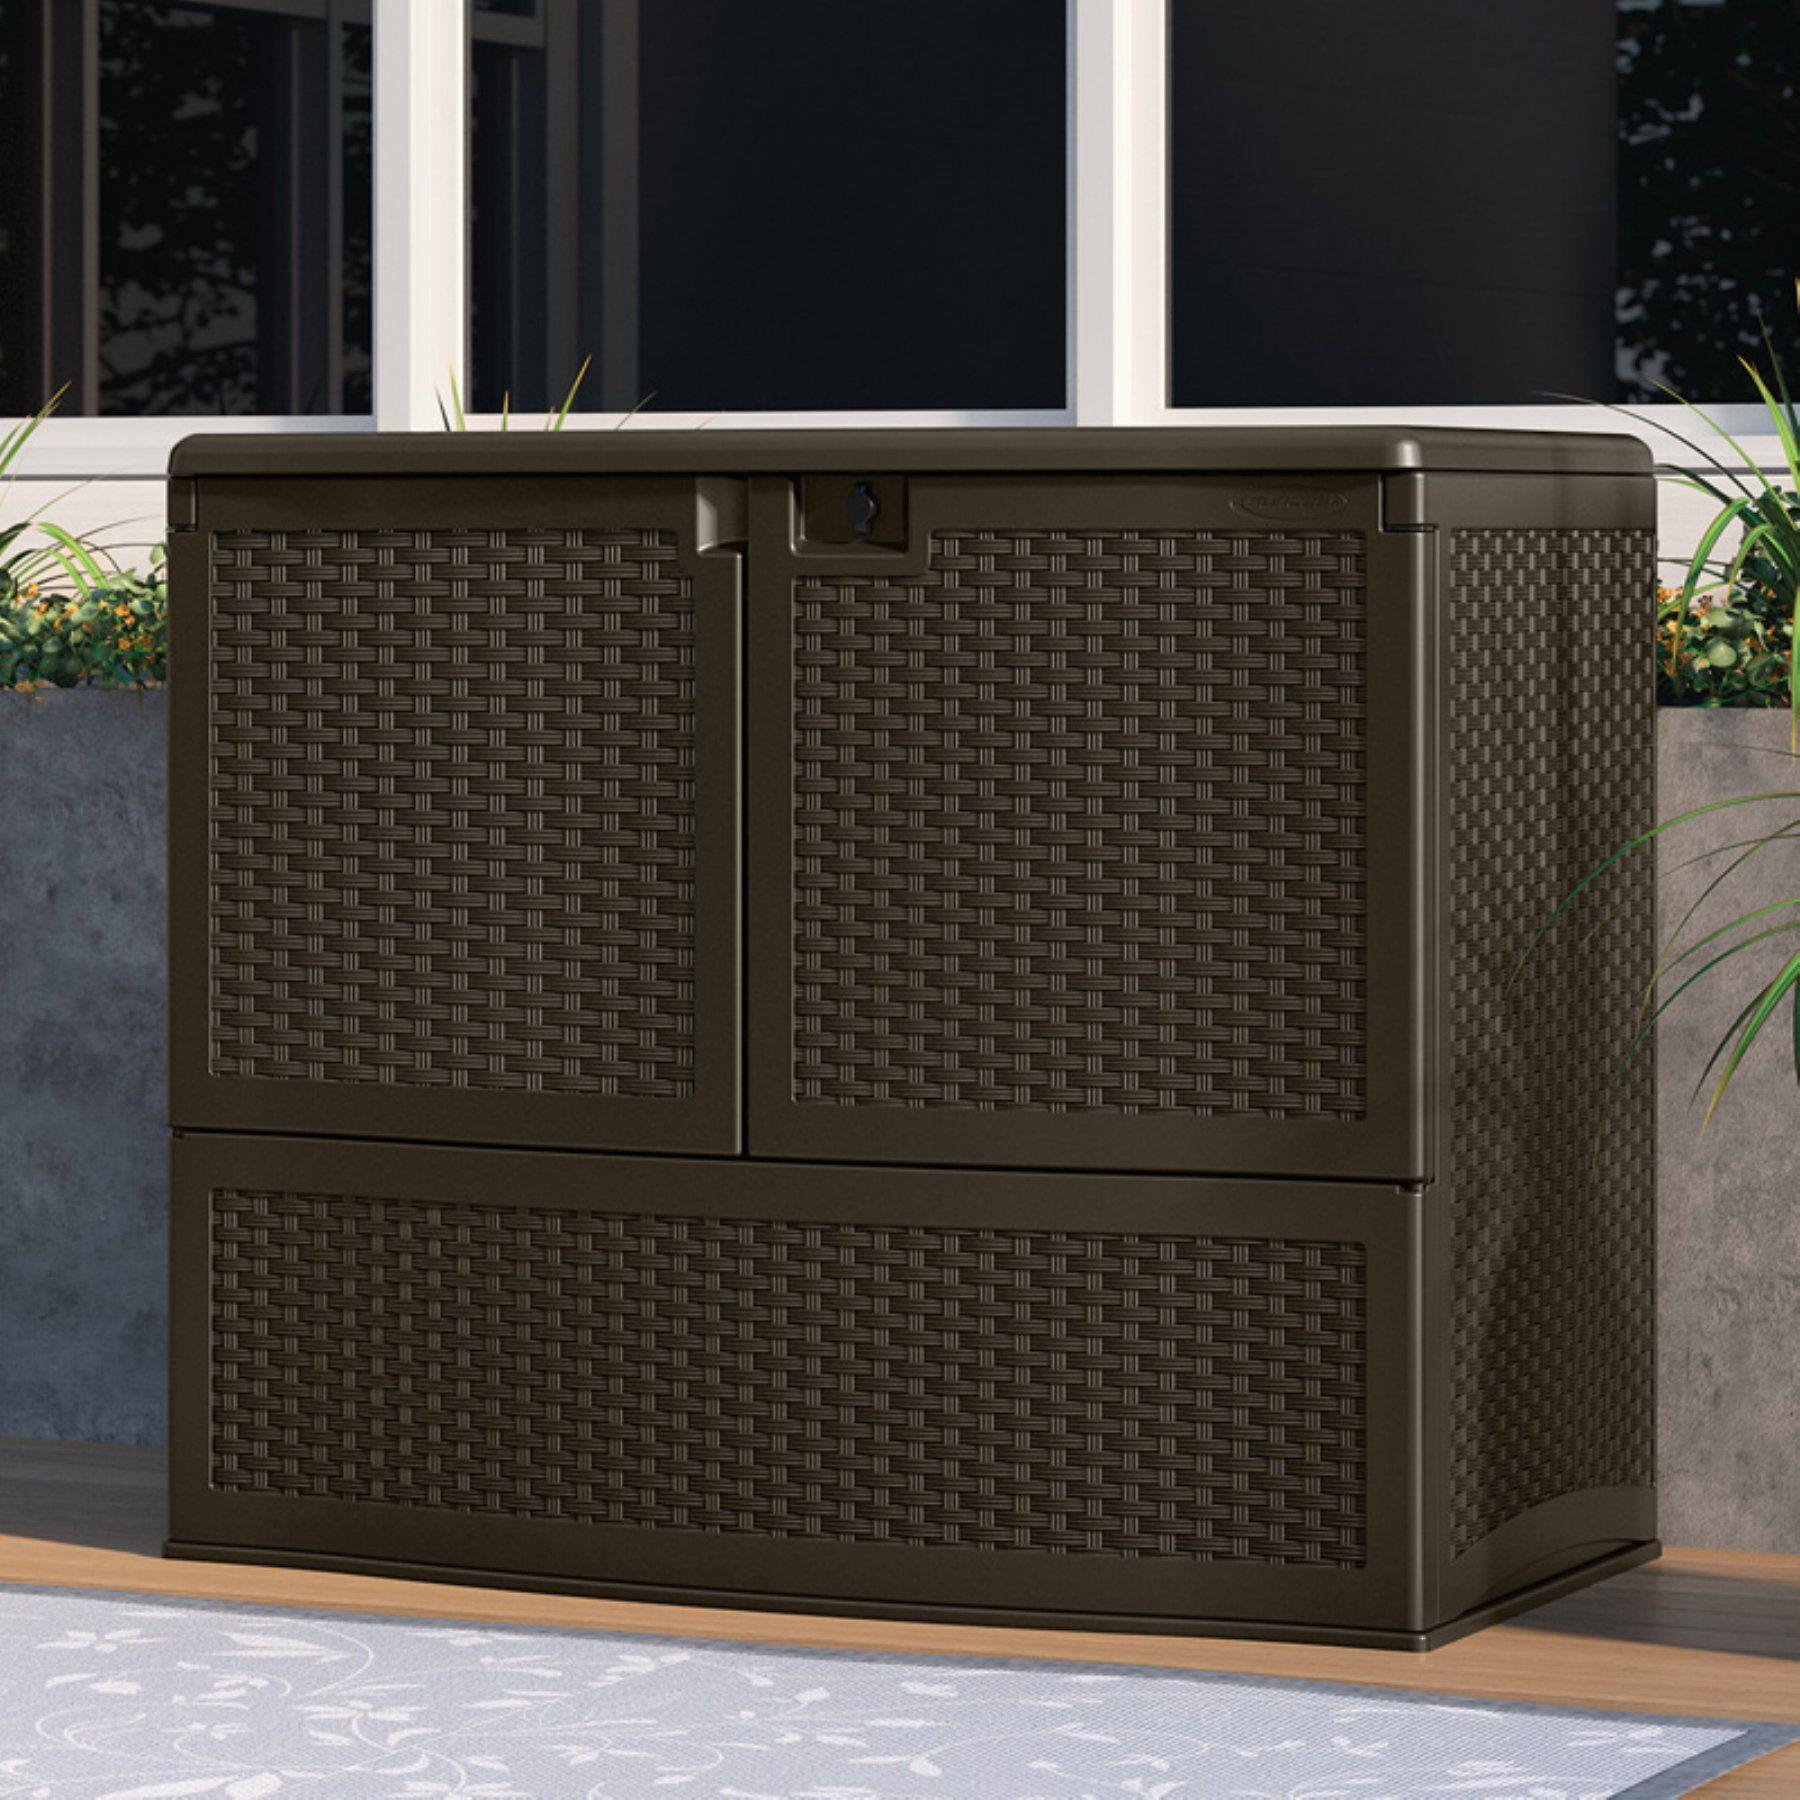 Miraculous Outdoor Suncast Backyard Oasis Storage And Entertaining Download Free Architecture Designs Fluibritishbridgeorg